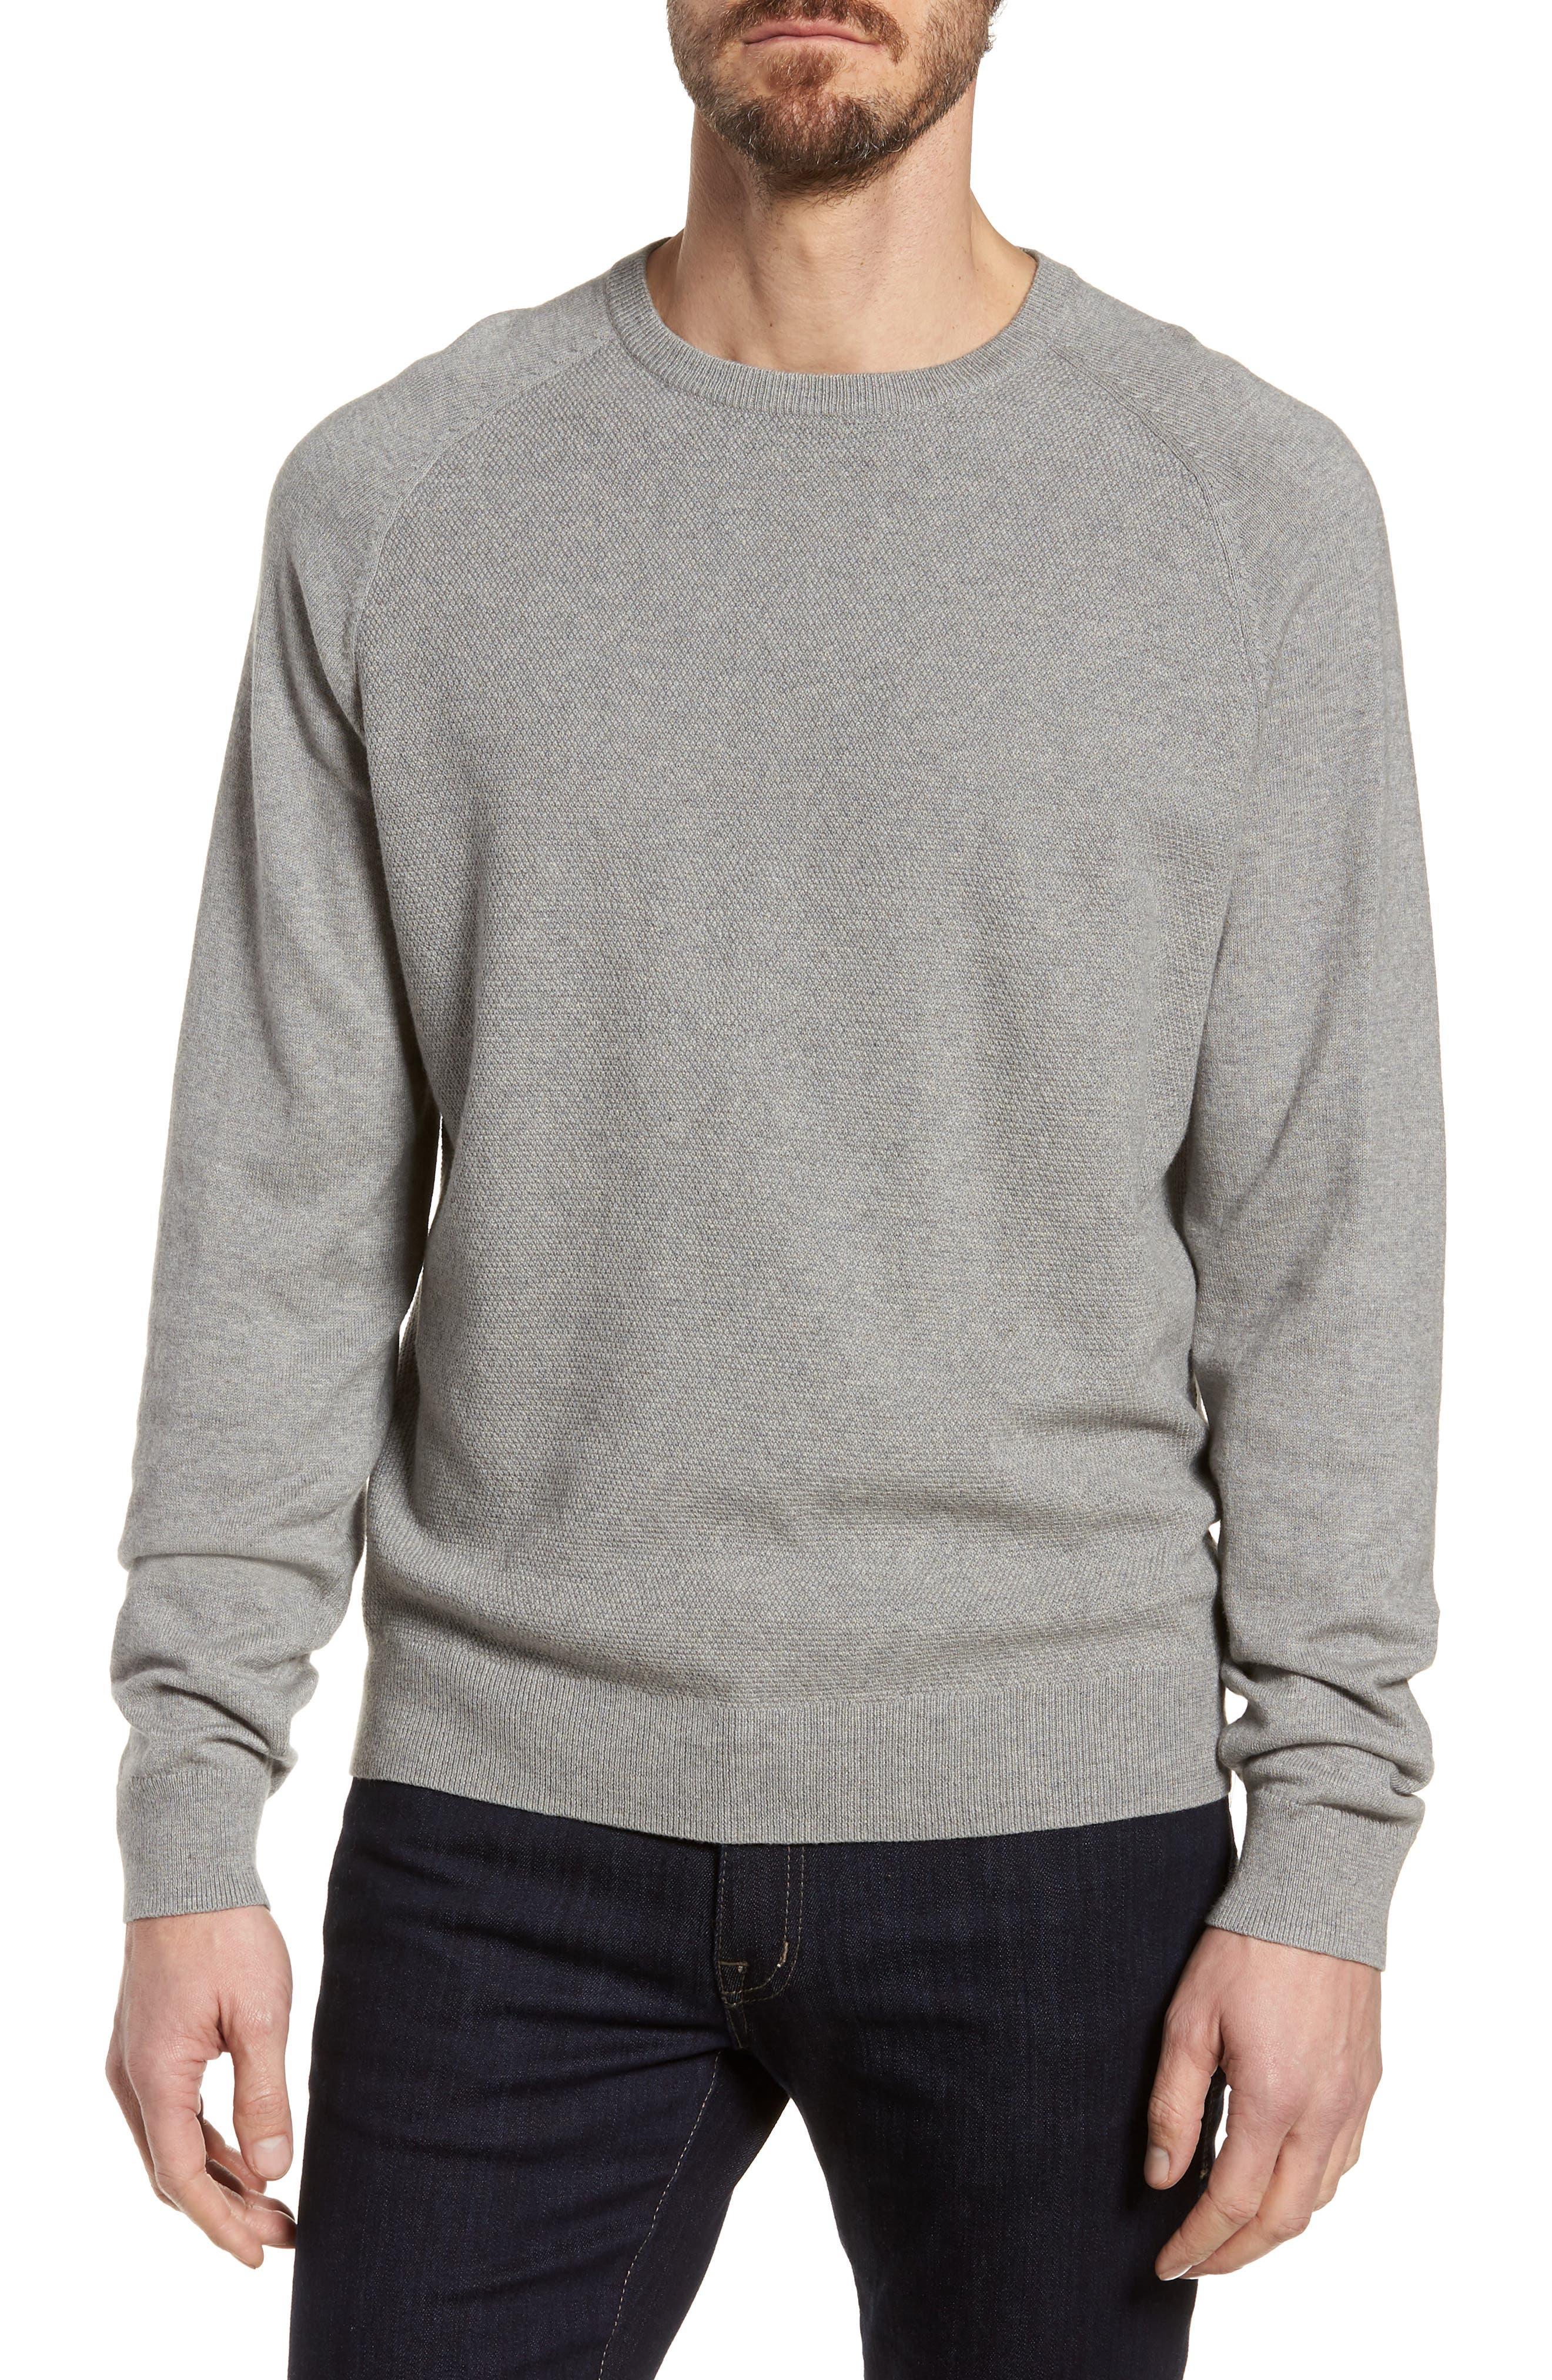 Crewneck Cotton & Cashmere Sweater,                             Main thumbnail 1, color,                             Grey Medium Heather